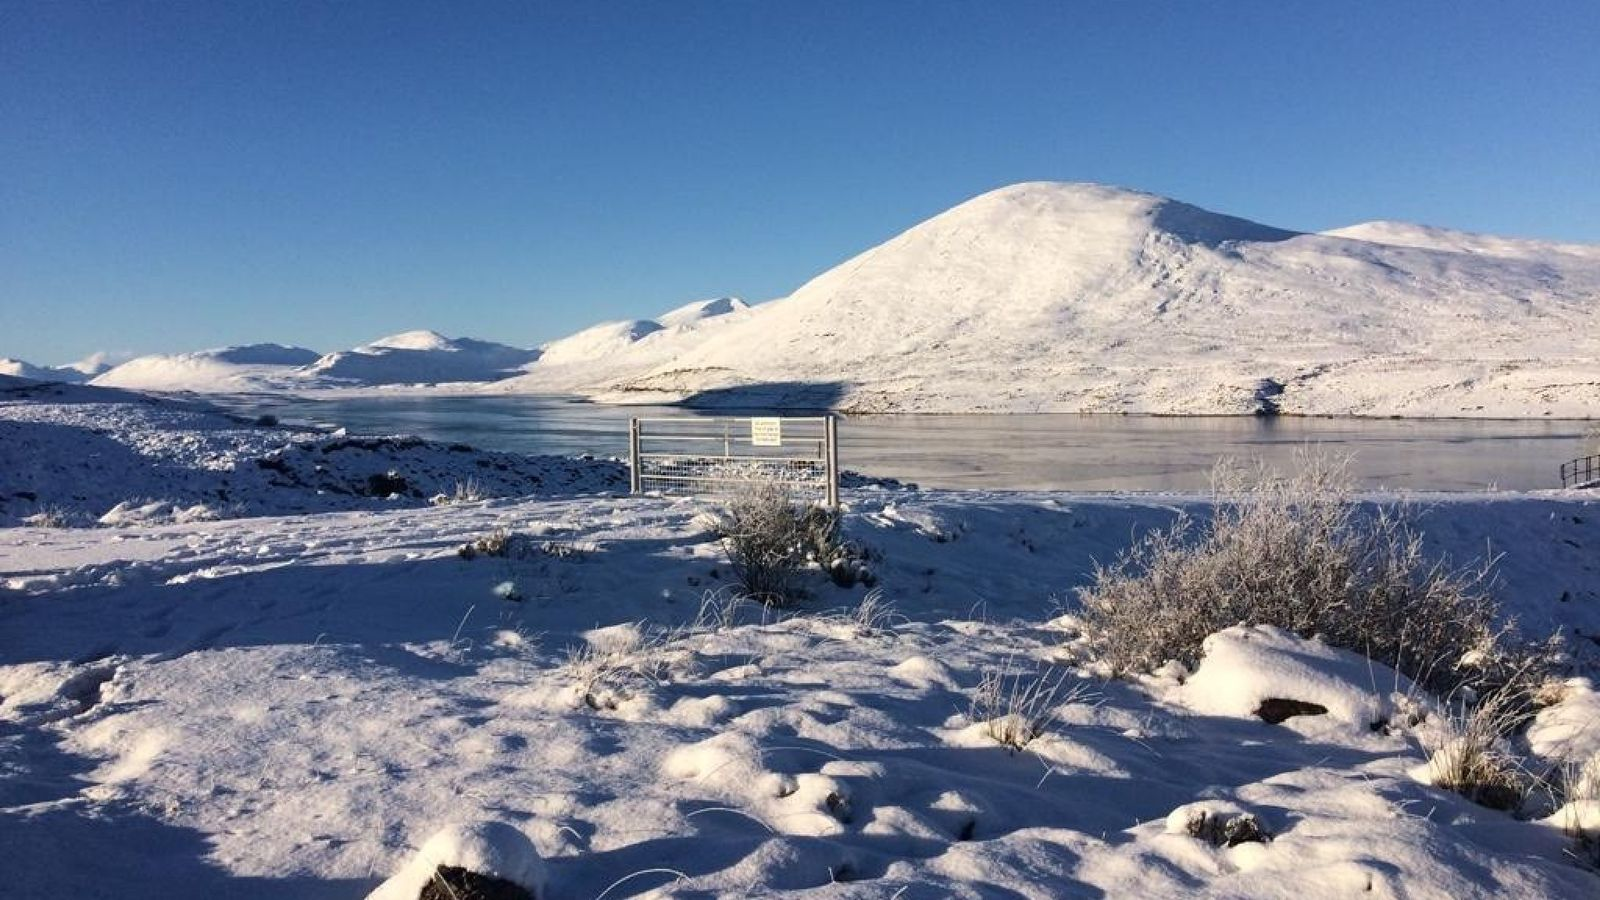 Snow in Ullapool, north Scotland, where temperatures dropped to -10C (14F) on Saturday. Pic: Bridget Oeppen